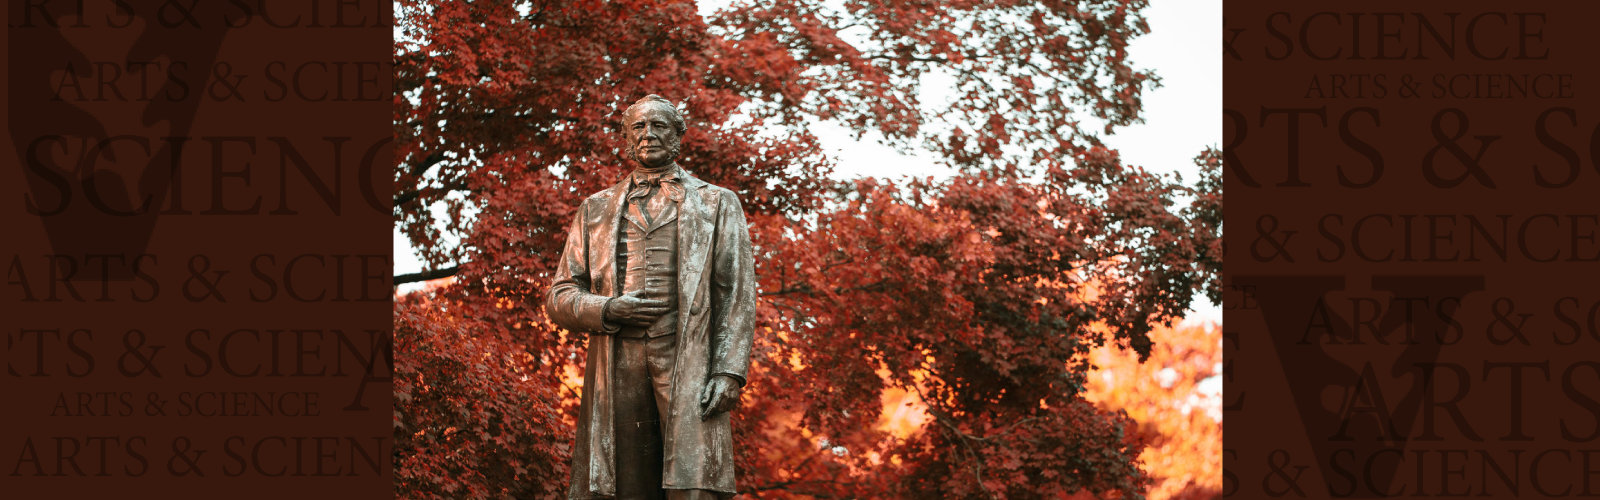 Vanderbilt releases Return to Campus plan for fall 2020 semester